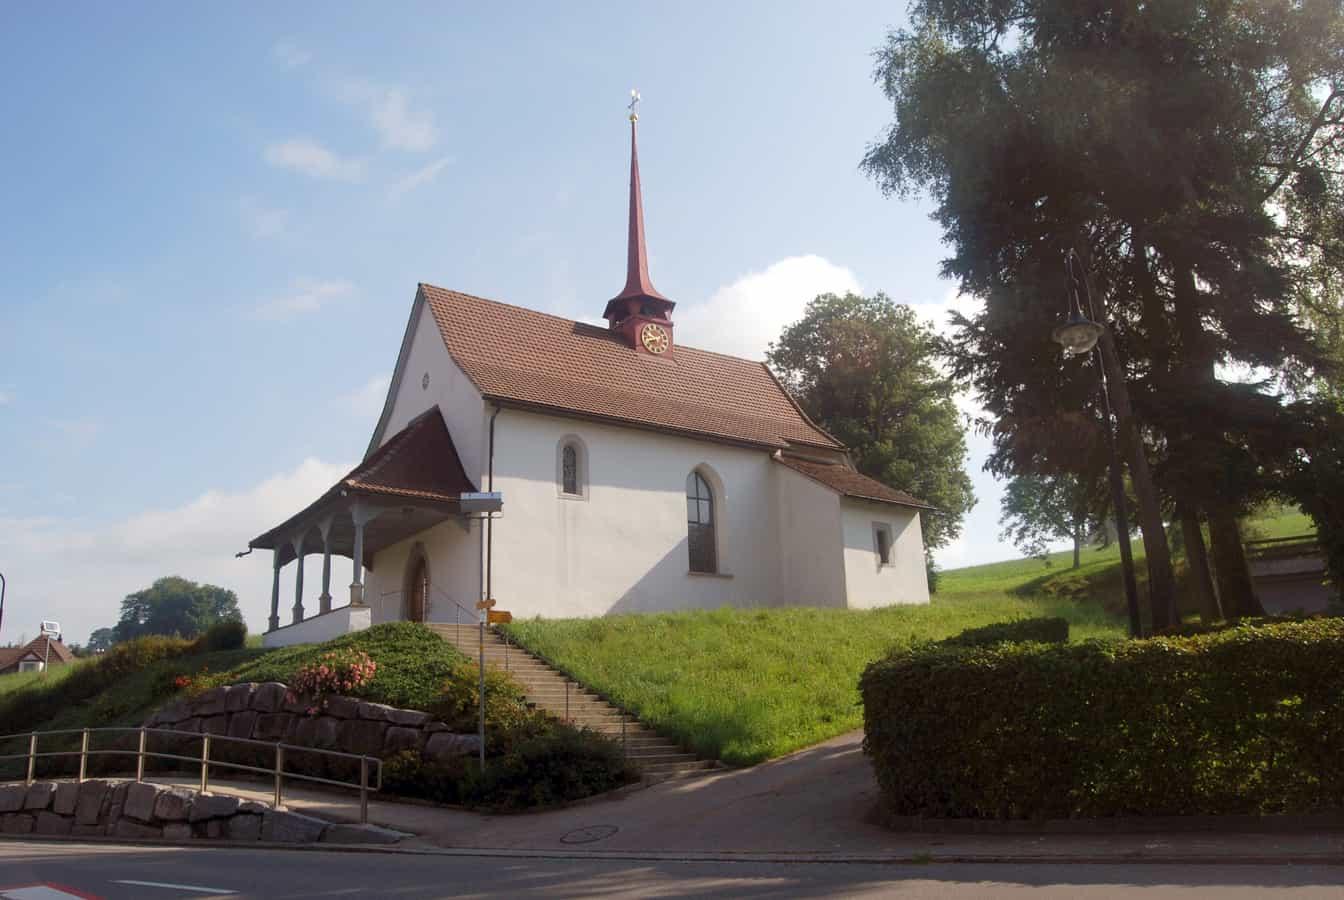 Kapelle St. Aper Fischbach